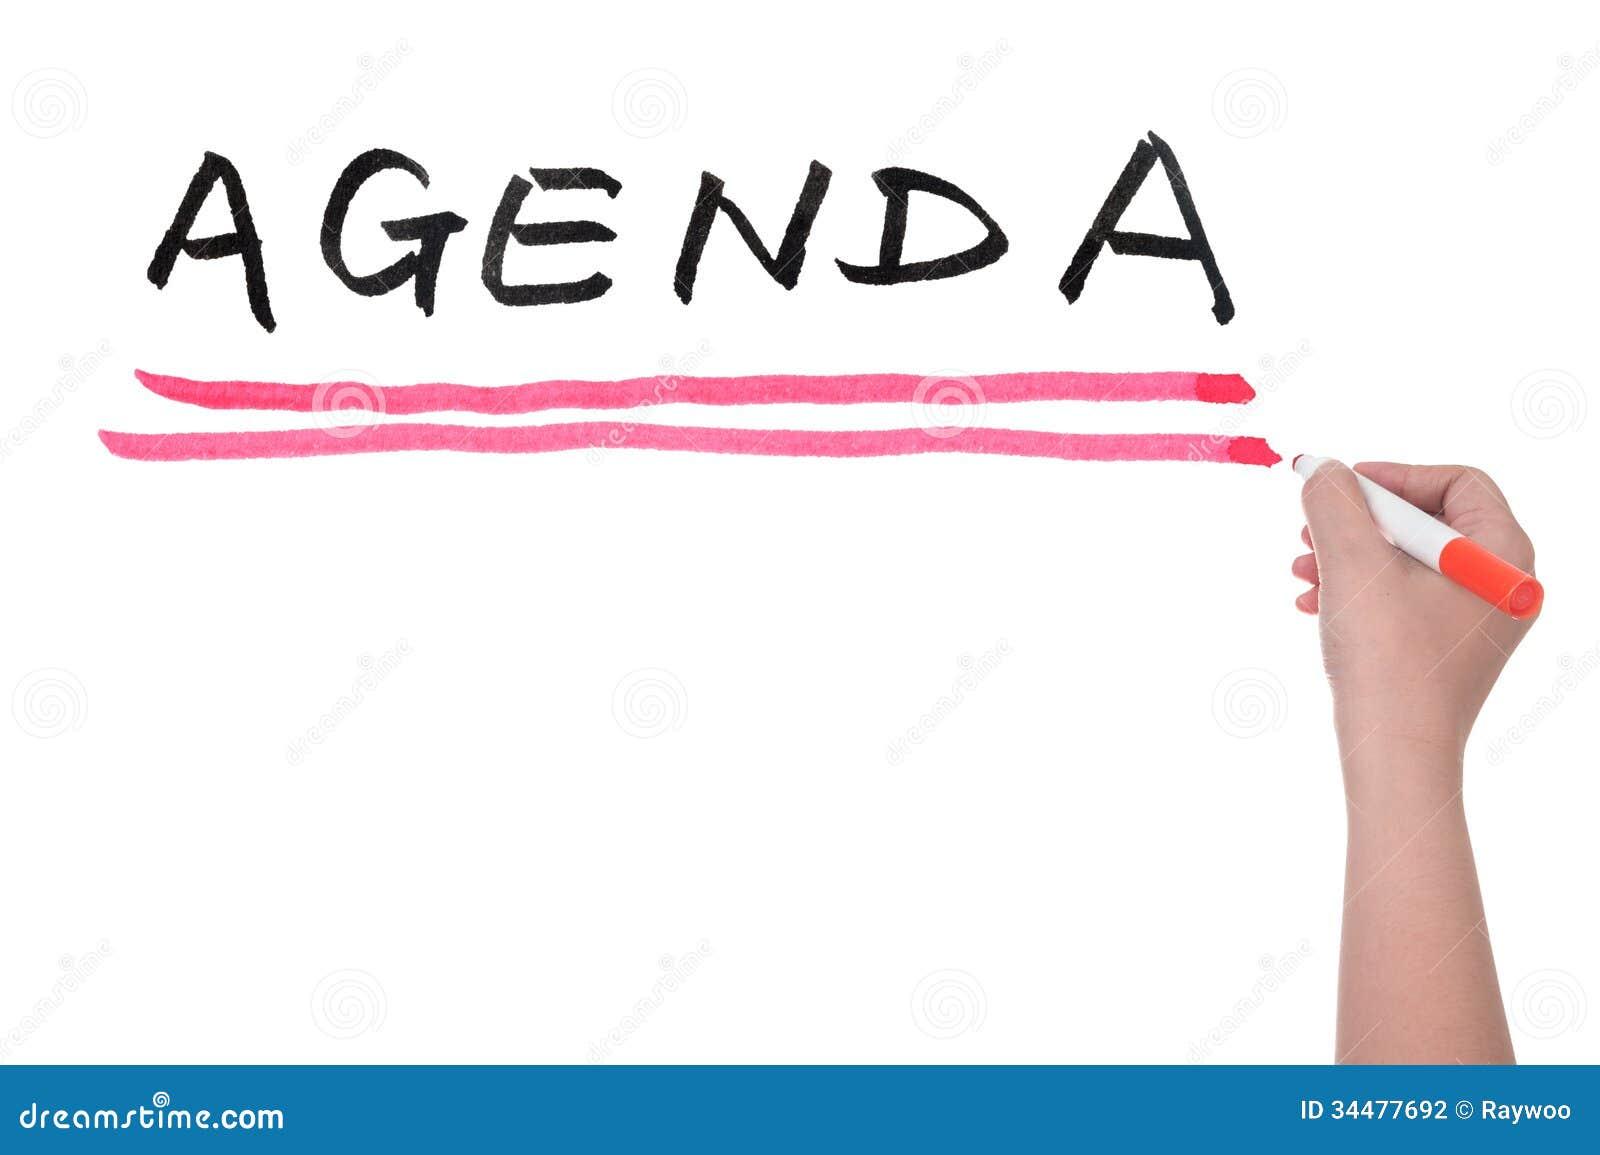 agenda stock photography image 34477692 notepad clip art transparent notepad clipart image